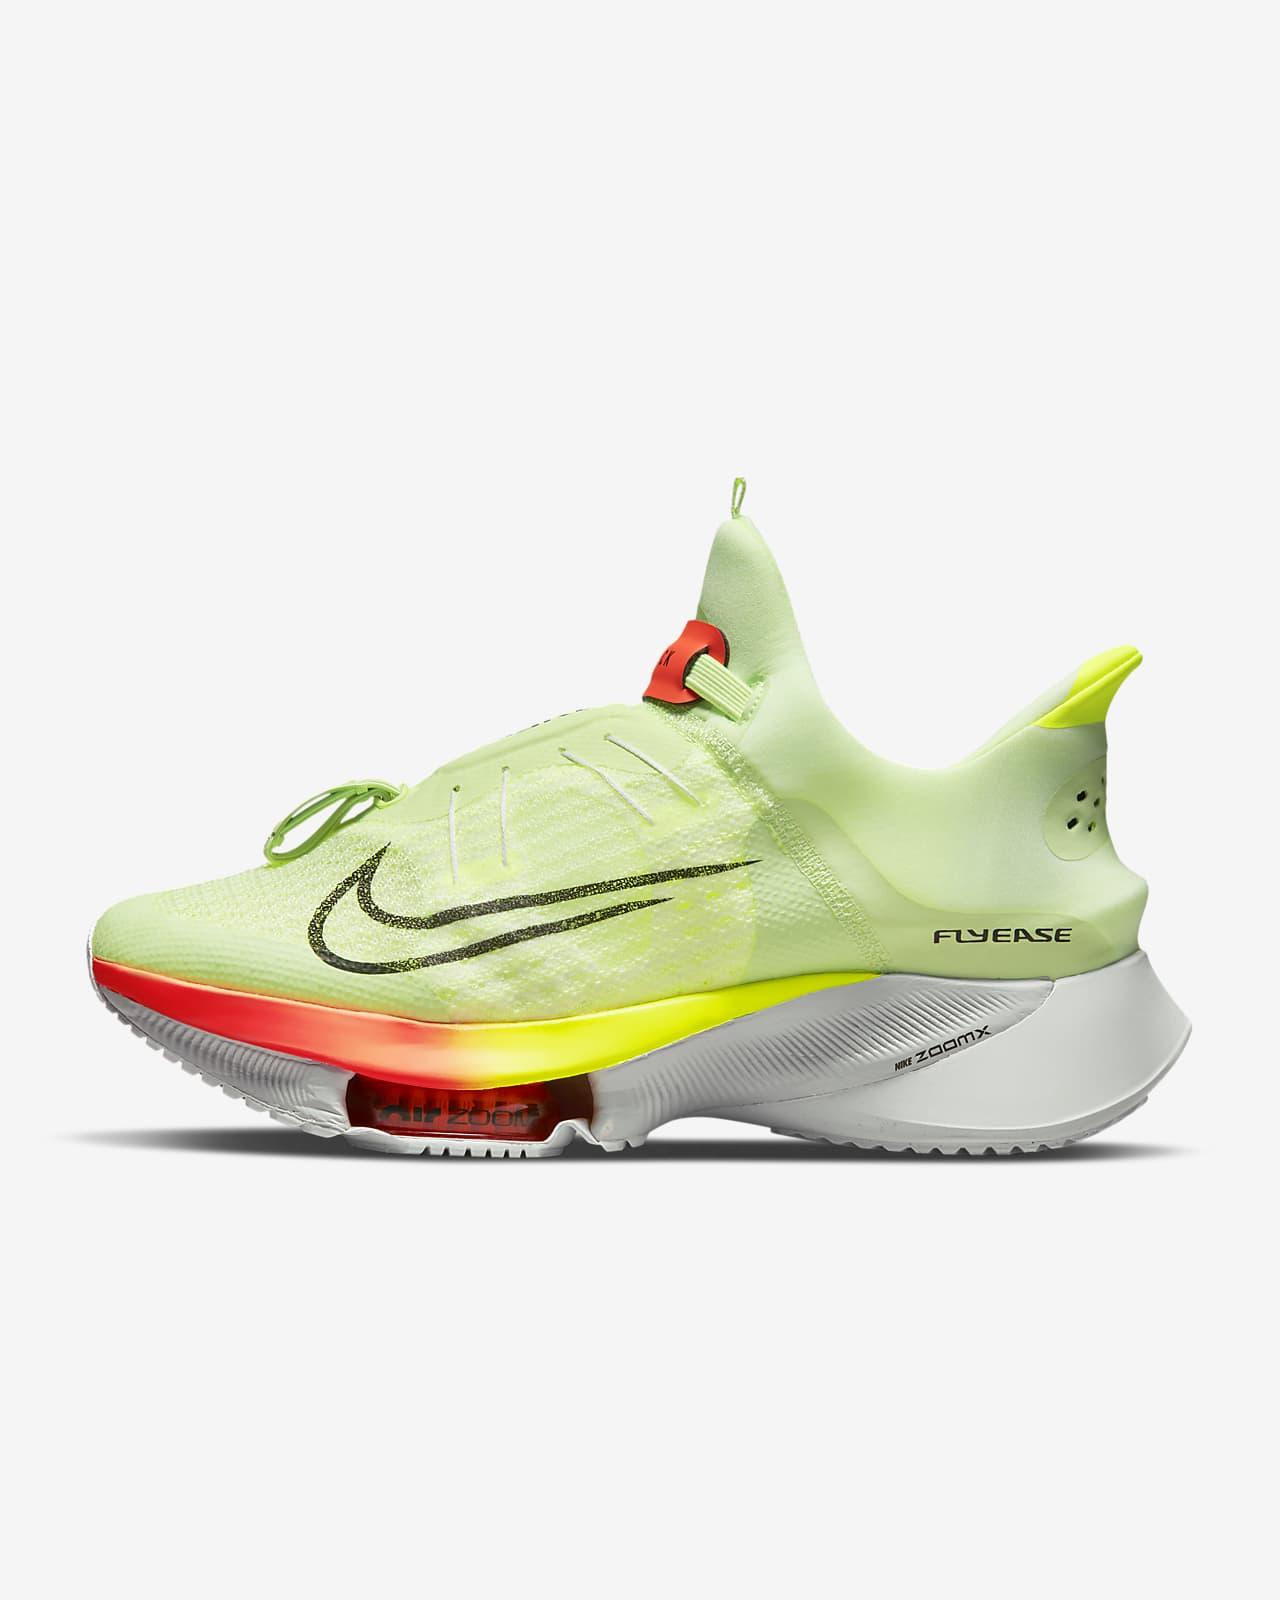 Nike Air Zoom Tempo NEXT% FlyEase Zapatillas de running para asfalto fáciles de poner y quitar - Hombre